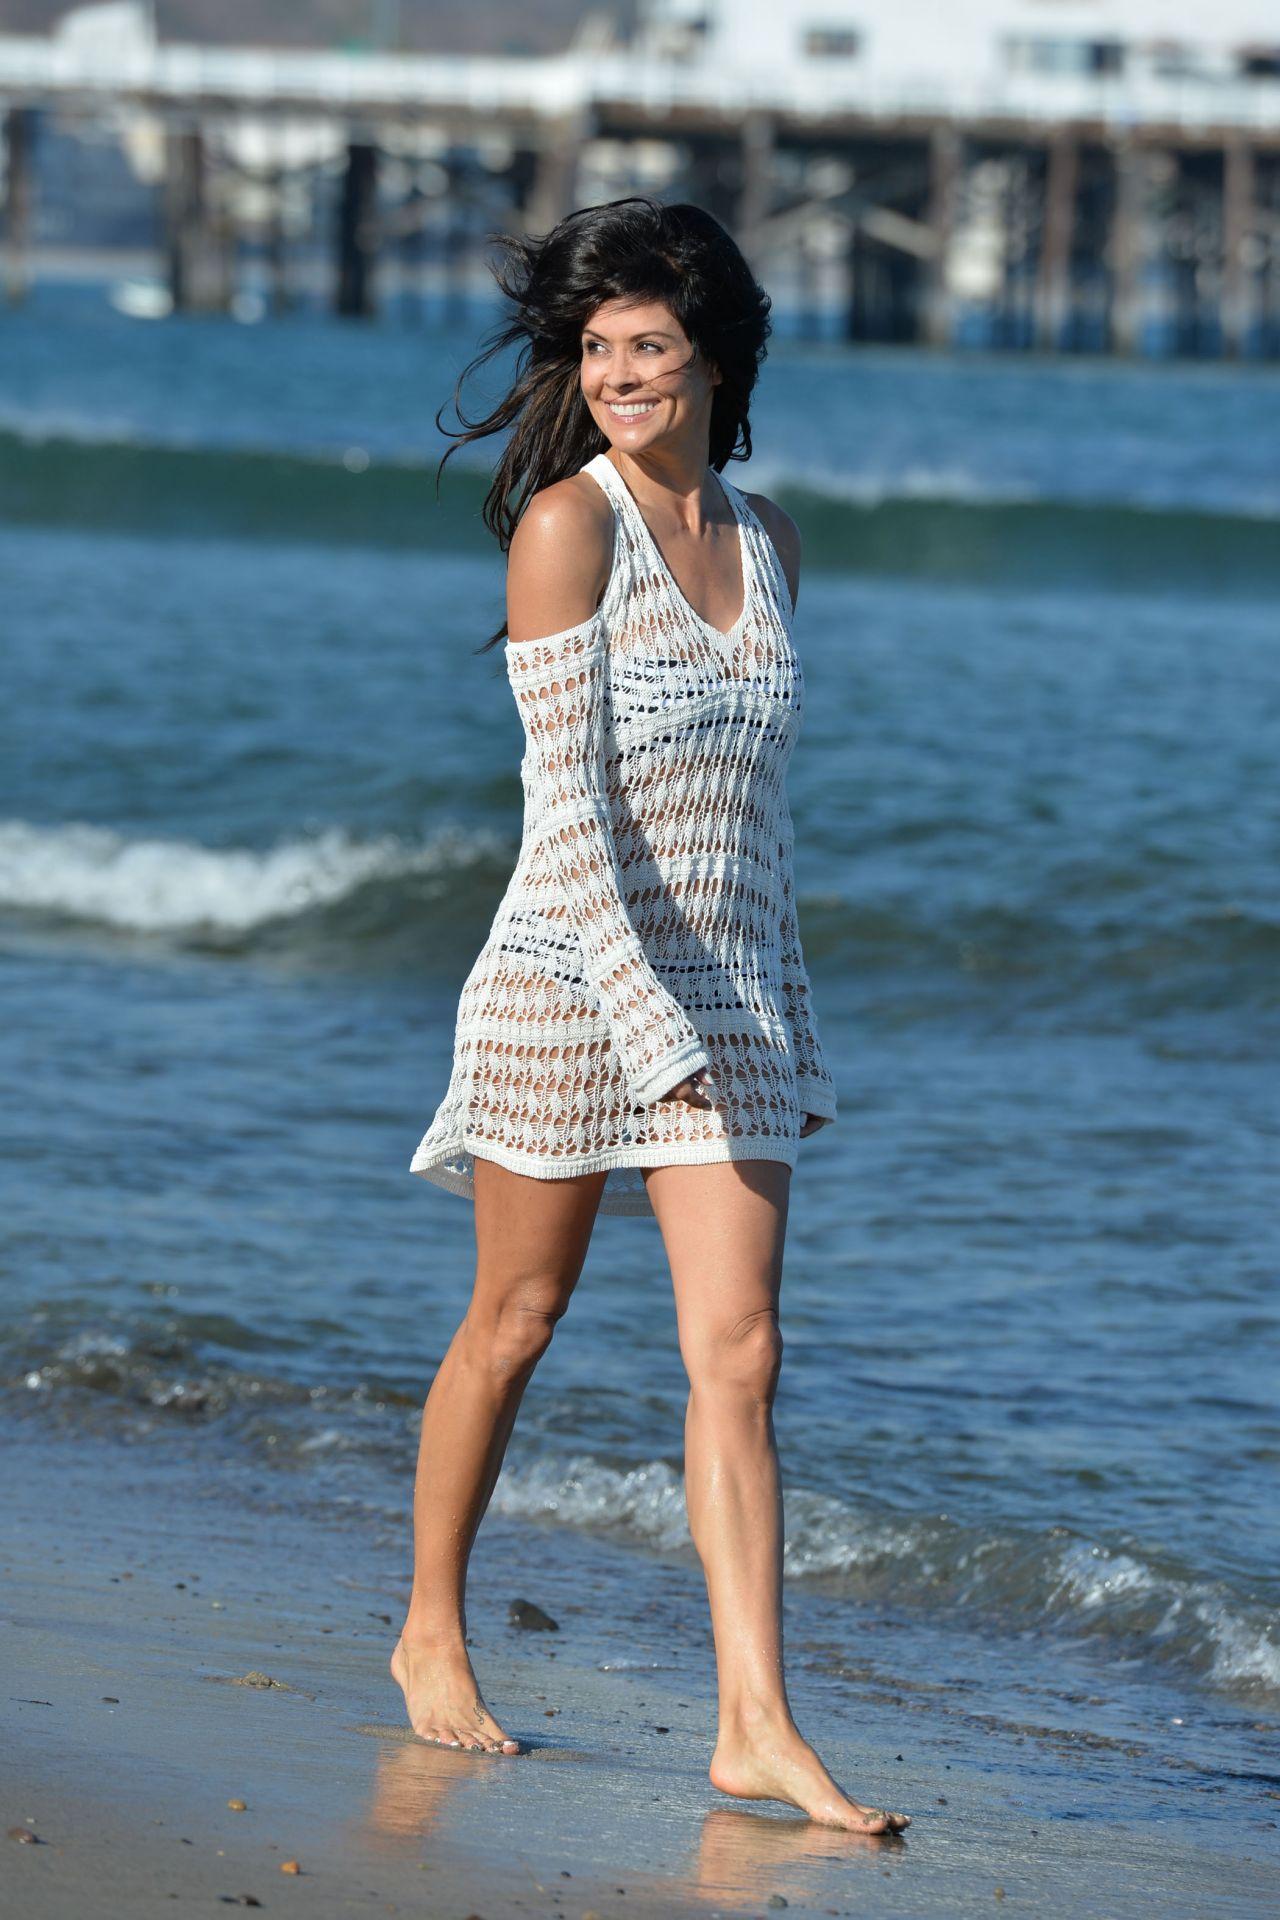 Brooke Burke In A Bikini On A Beach In Malibu July 2015